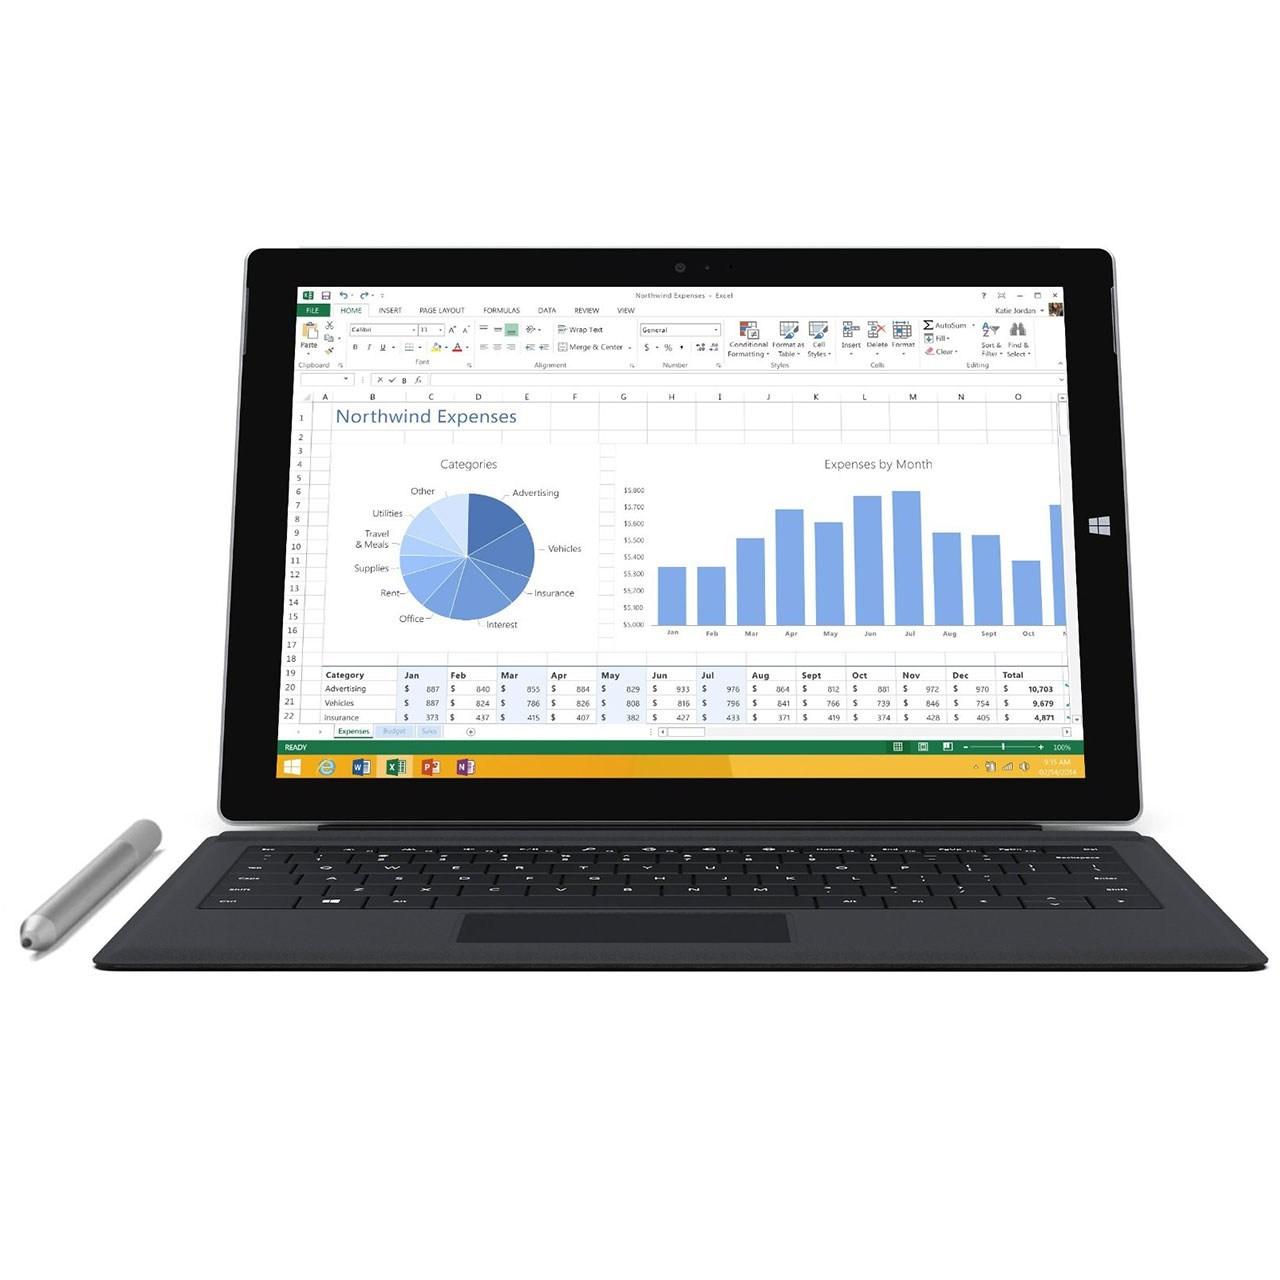 تبلت مایکروسافت مدل Surface Pro 3 - A به همراه کیبورد ظرفیت 256 گیگابایت